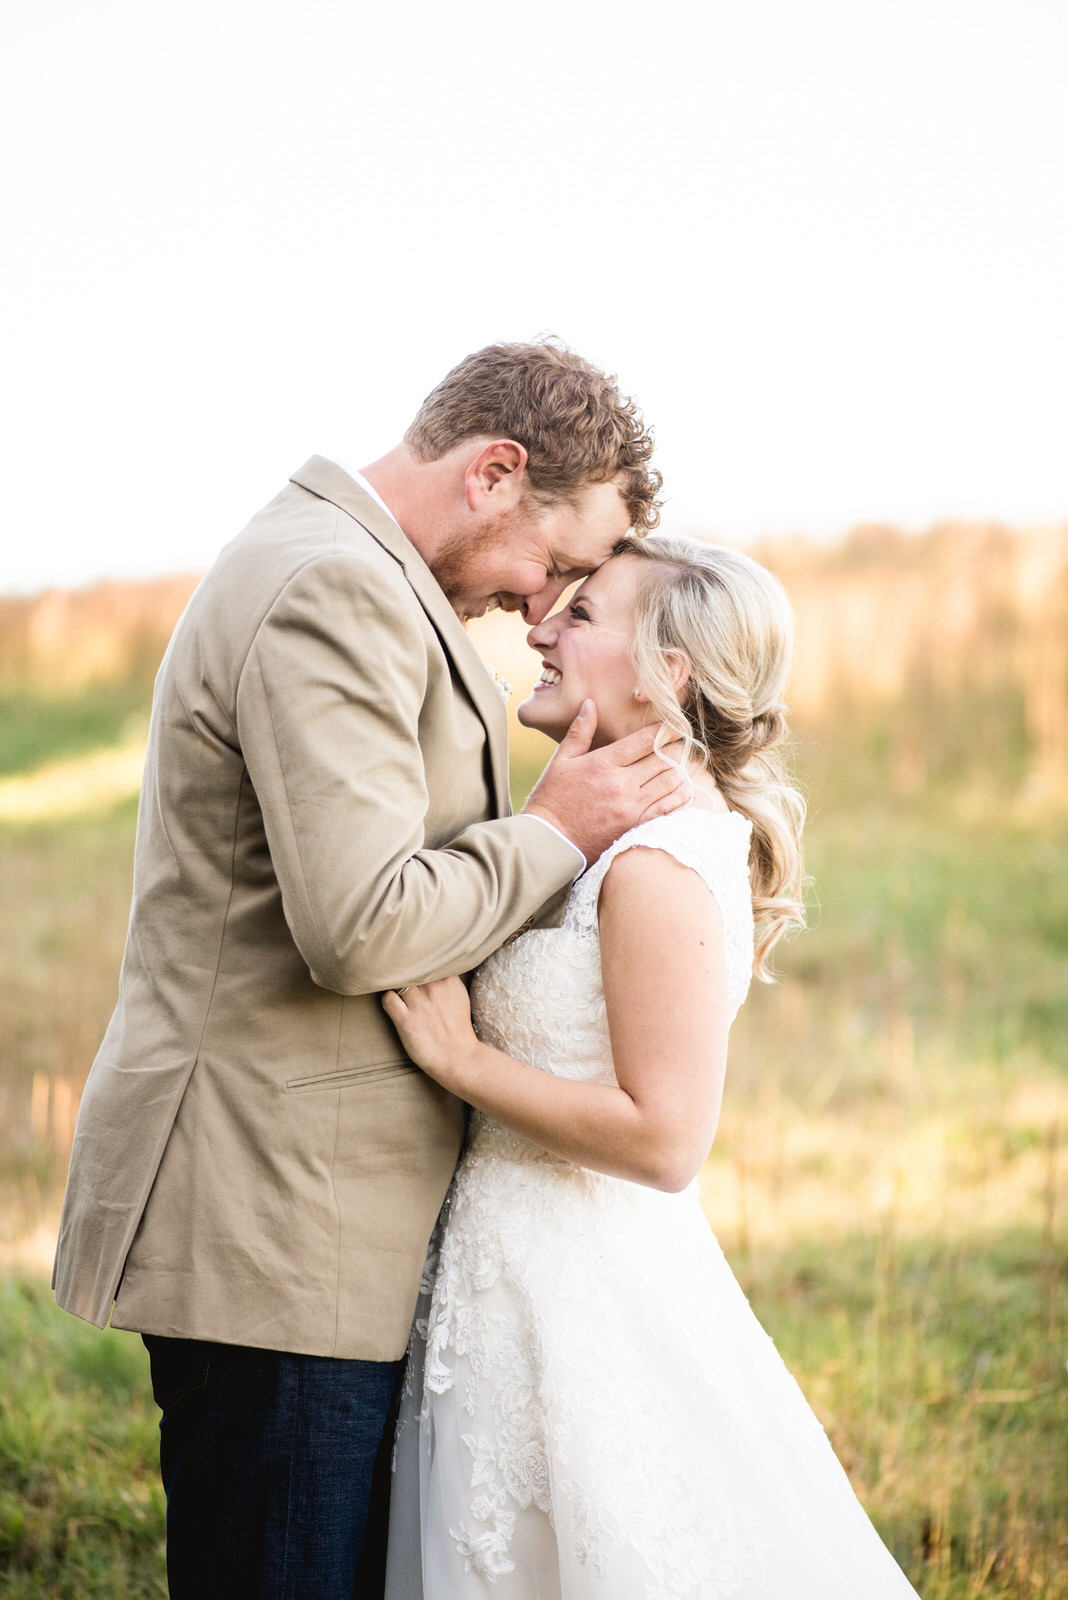 wedding_at_red_fox_winery_wedding_photographer027.jpg